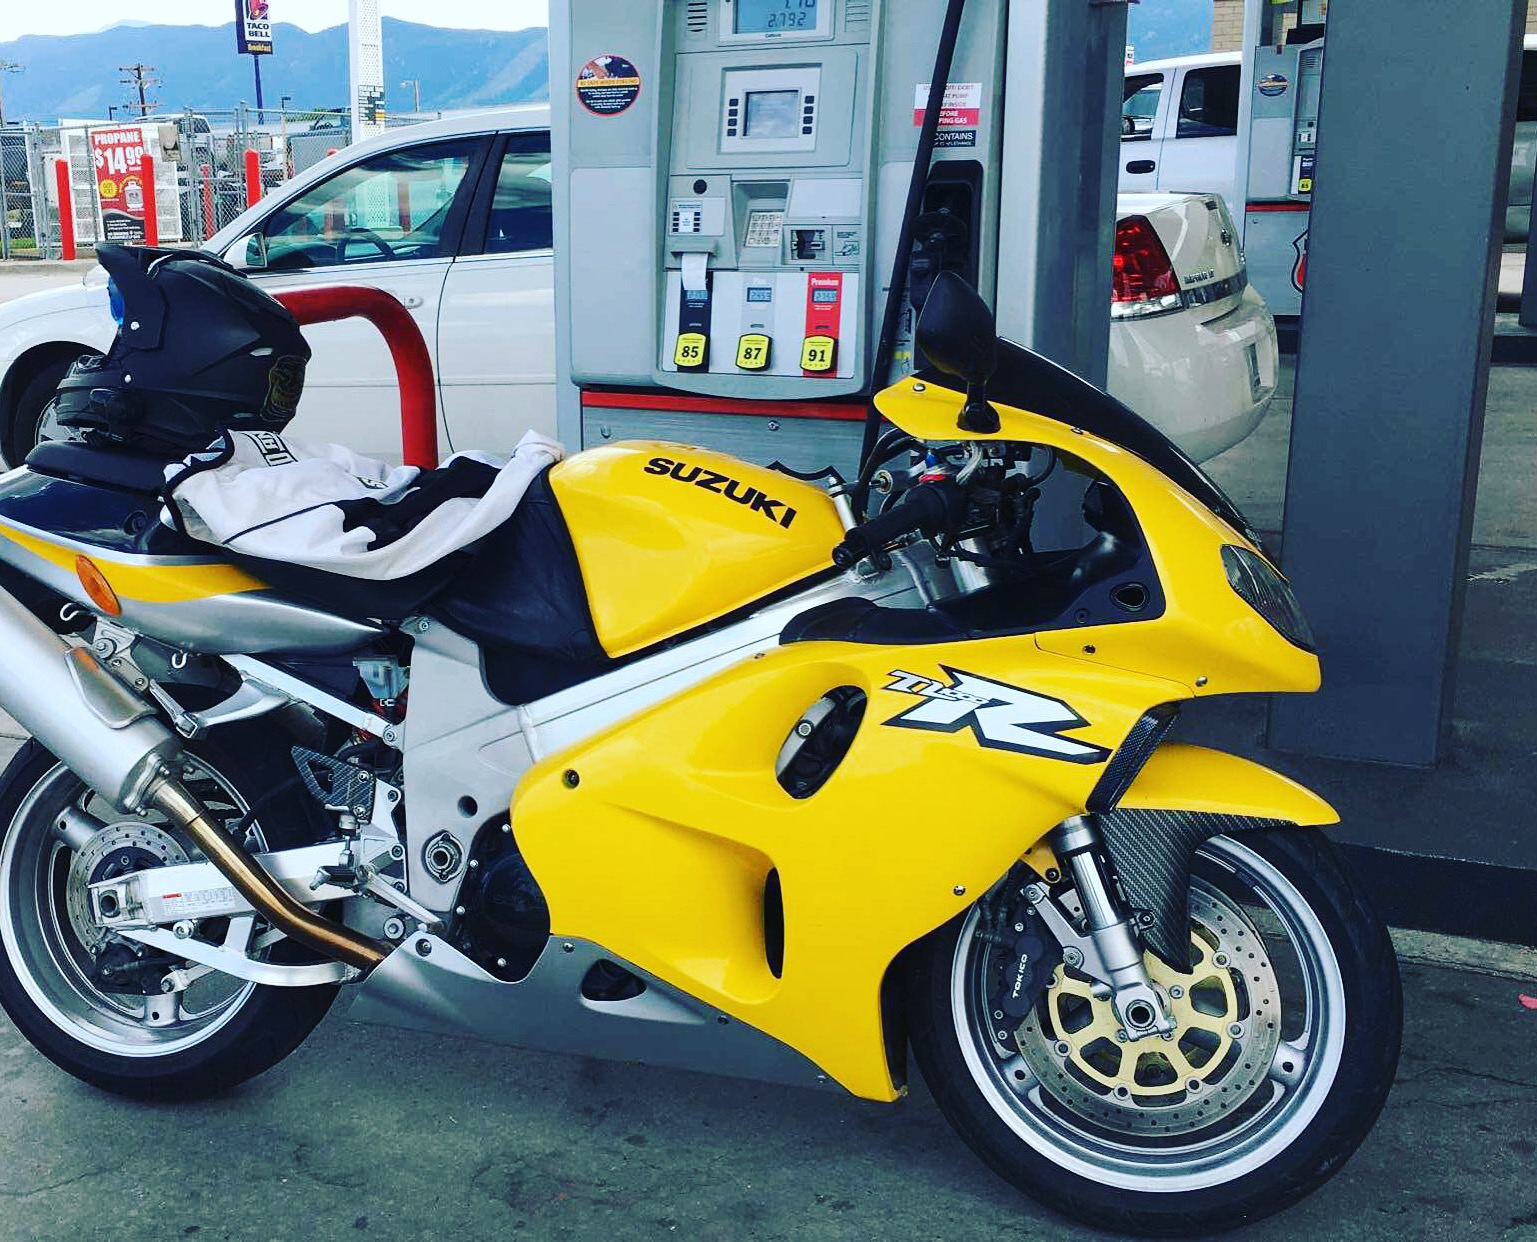 The Yellow TL1000R - A myth?-img_0648_1500867797674.jpg